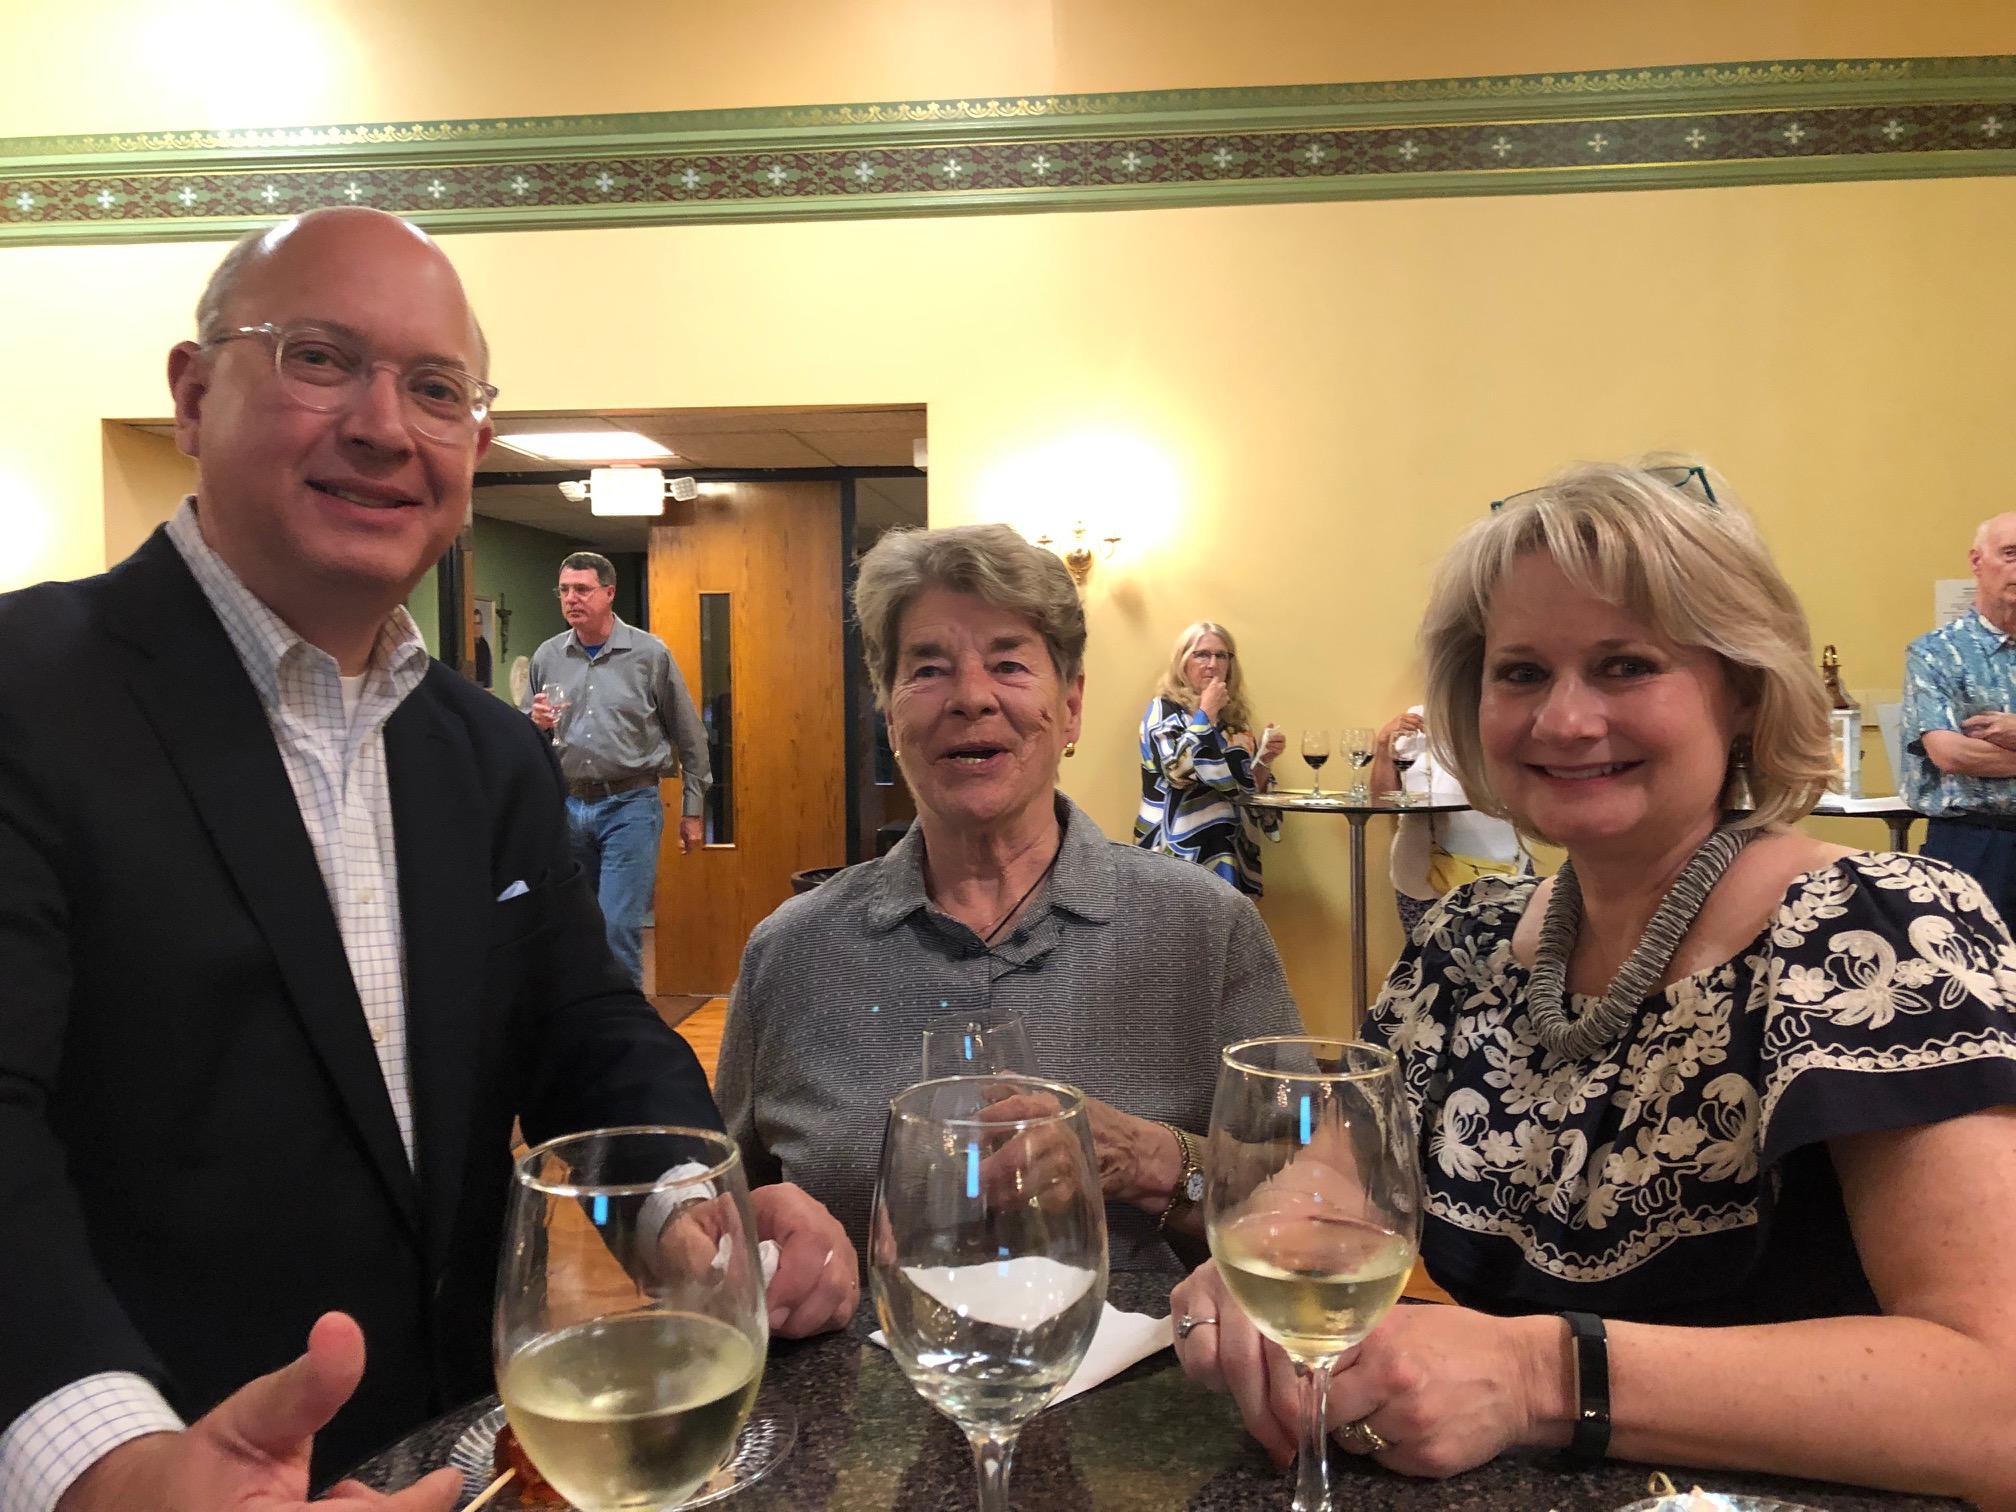 Ed Stewart with tenor Meg Hemingway & alto Shelley Stewart